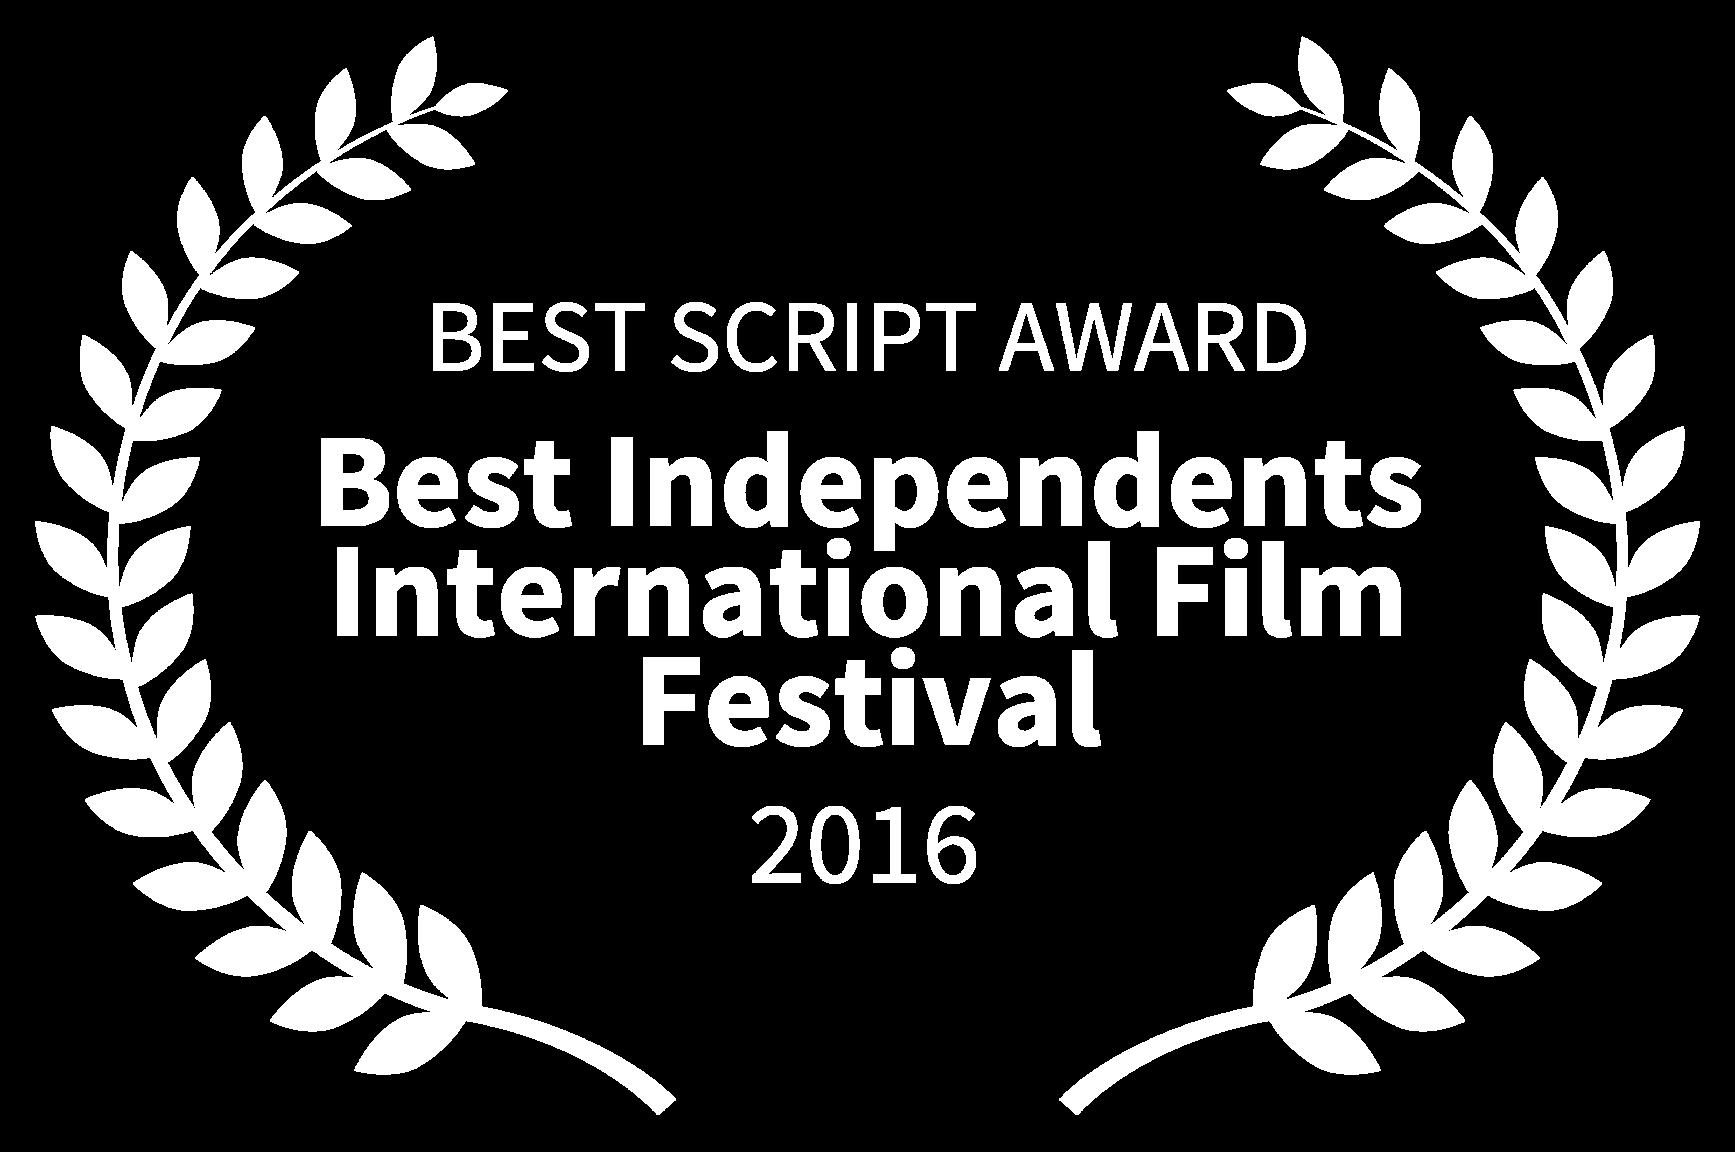 BEST SCRIPT AWARD - Best Independents International Film Festival - 2016